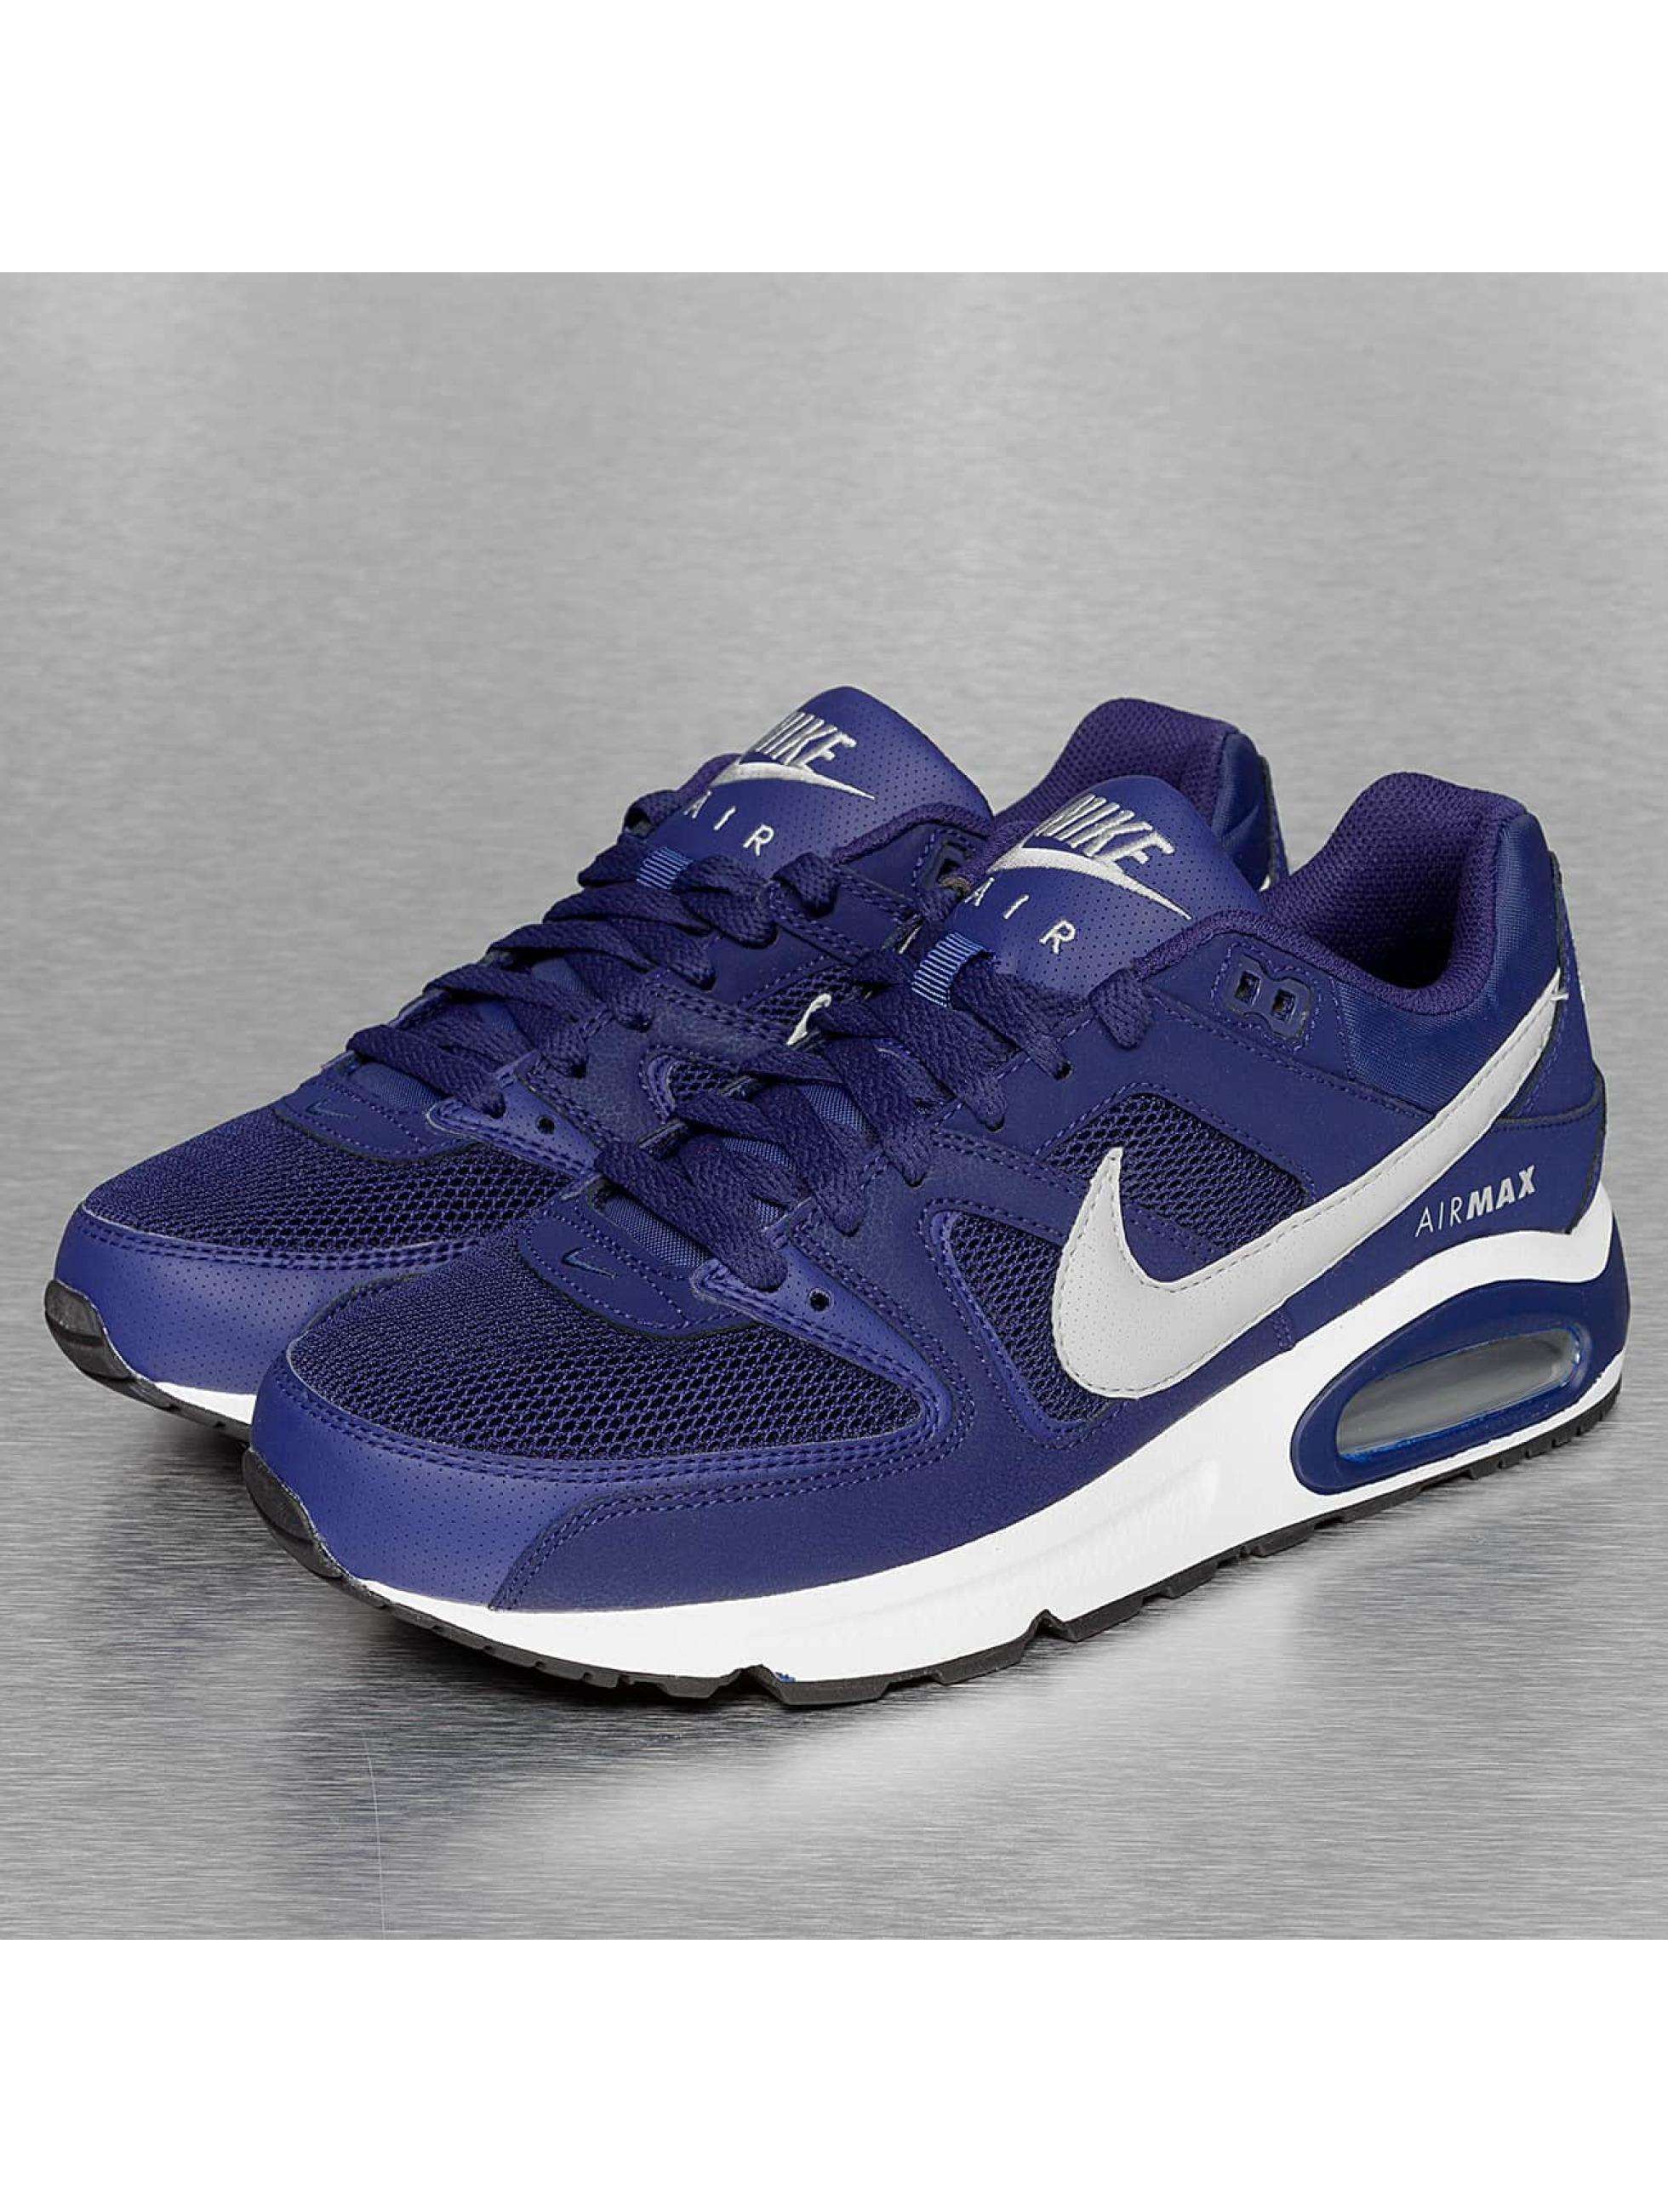 nike schuhe sneaker air max command in blau 241176. Black Bedroom Furniture Sets. Home Design Ideas